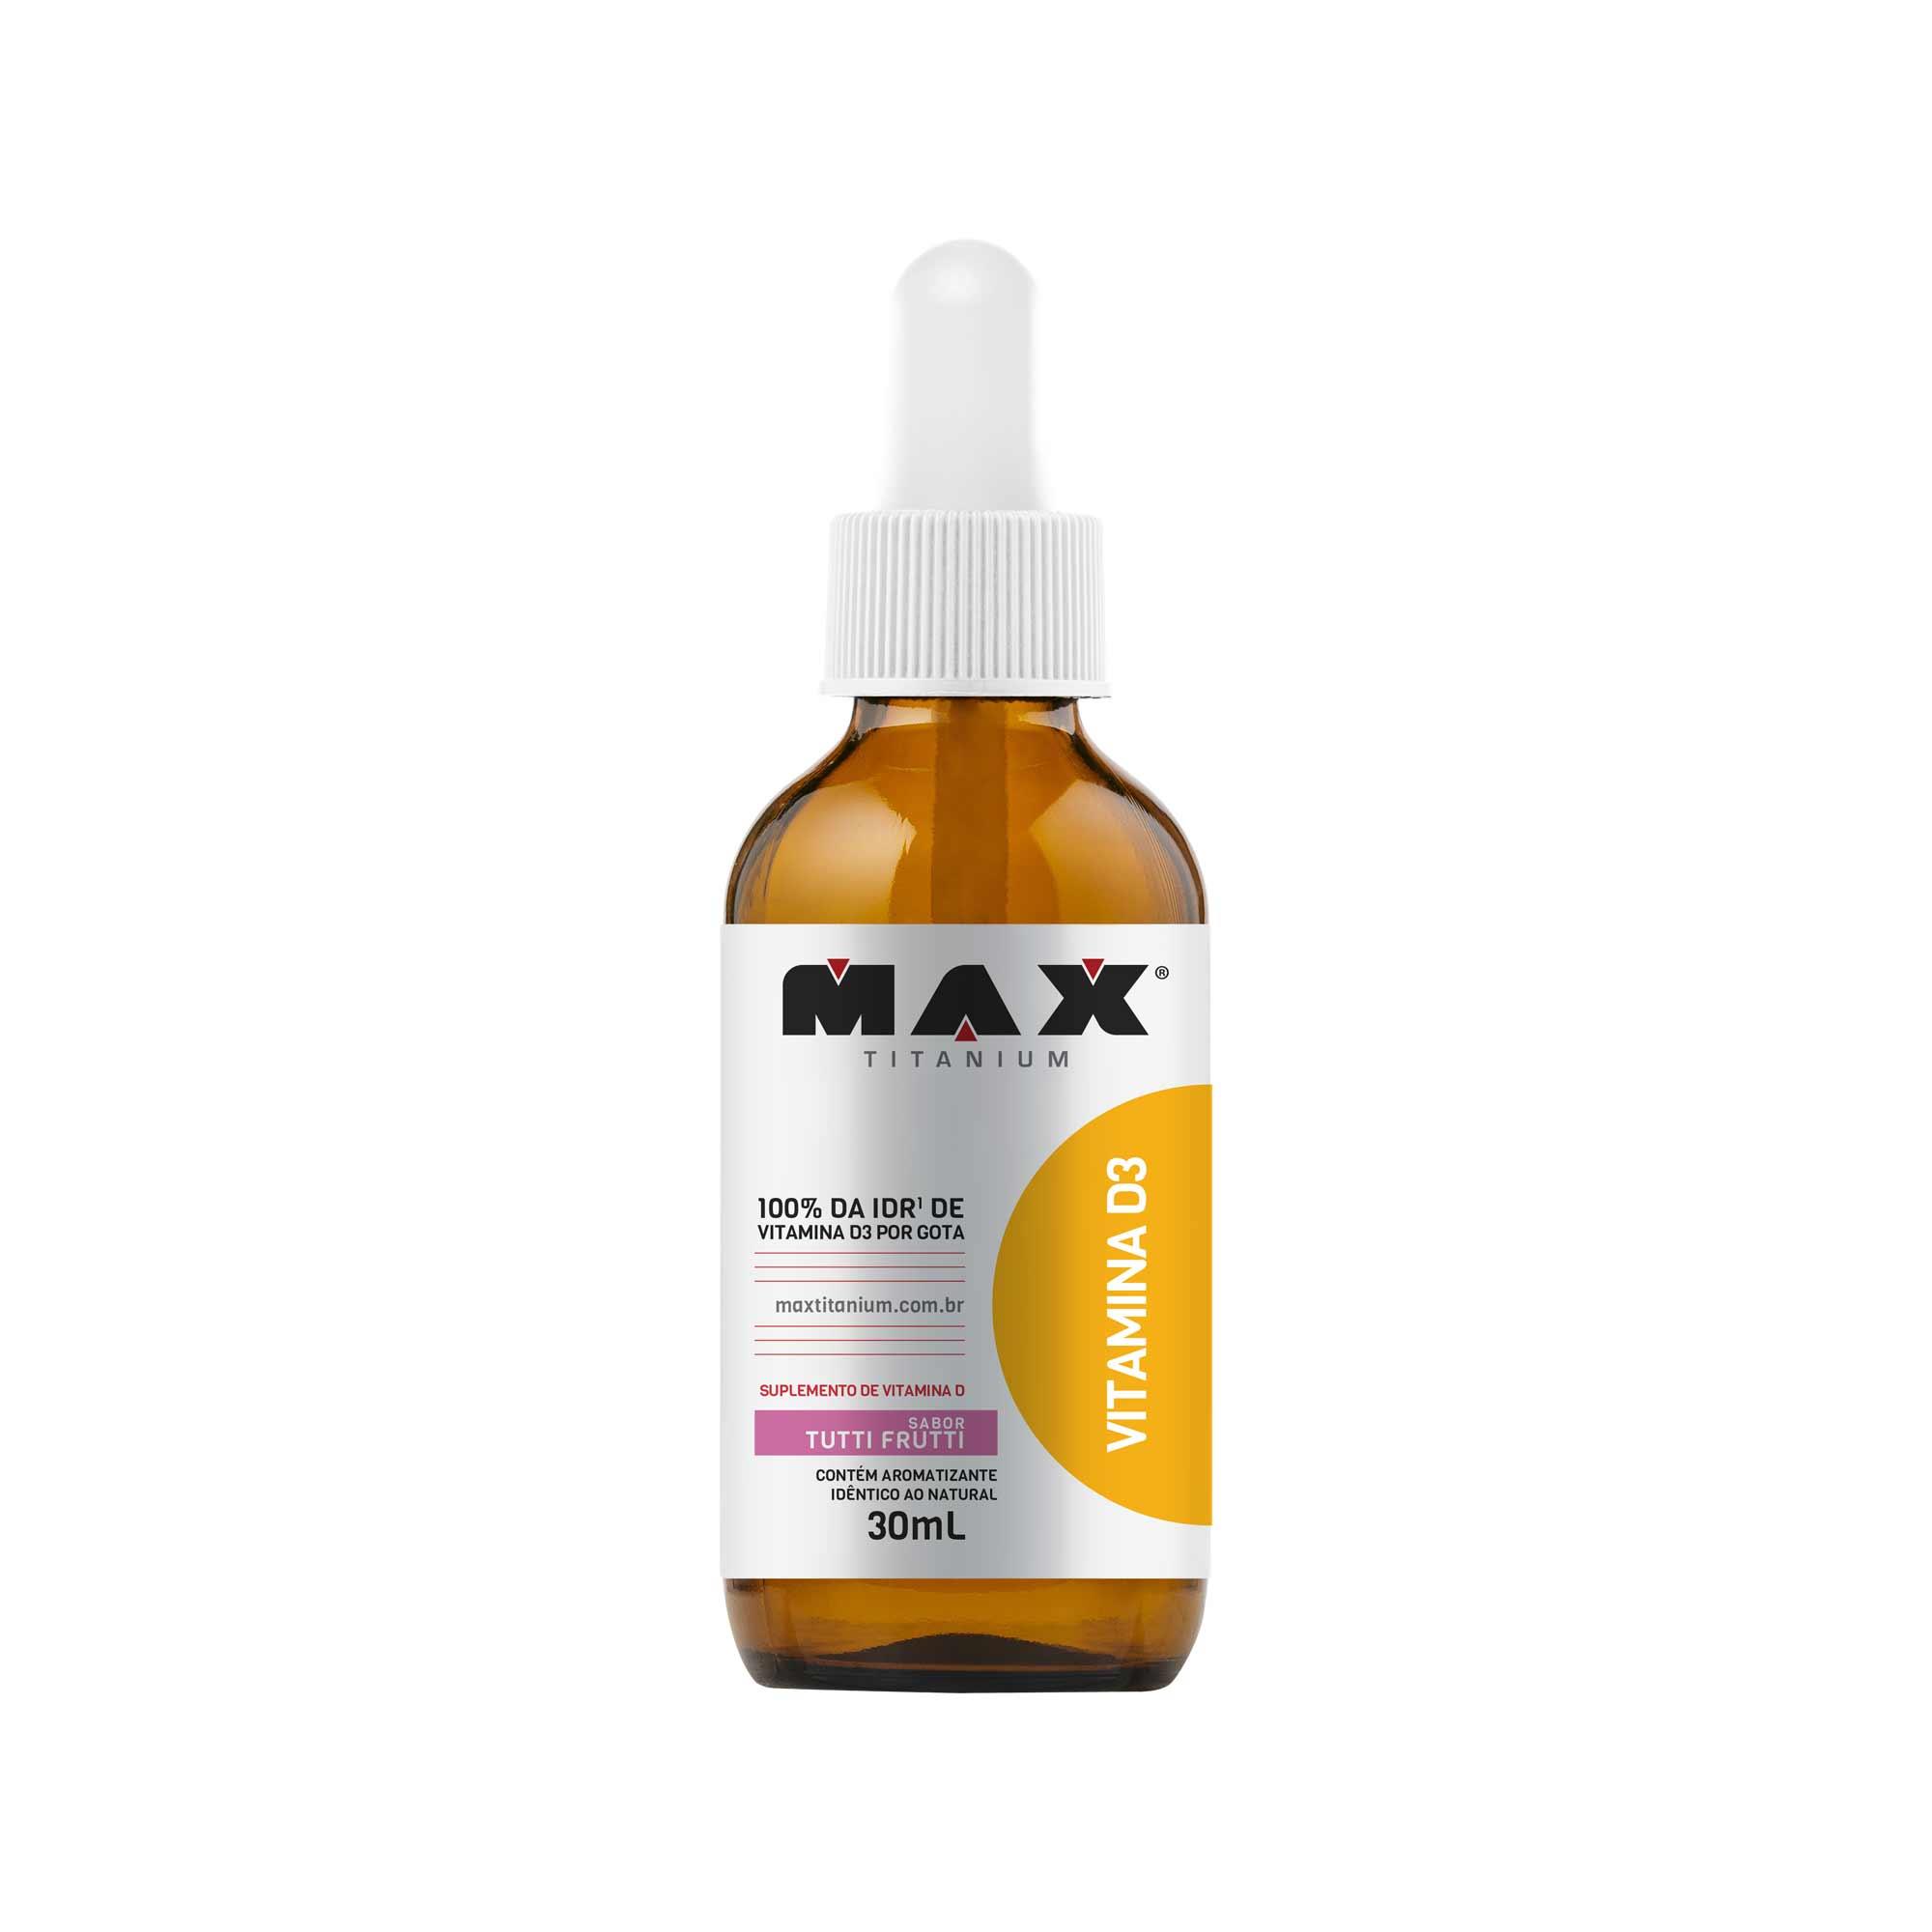 Vitamina D3 tuti frutti 30ml Max Titanium